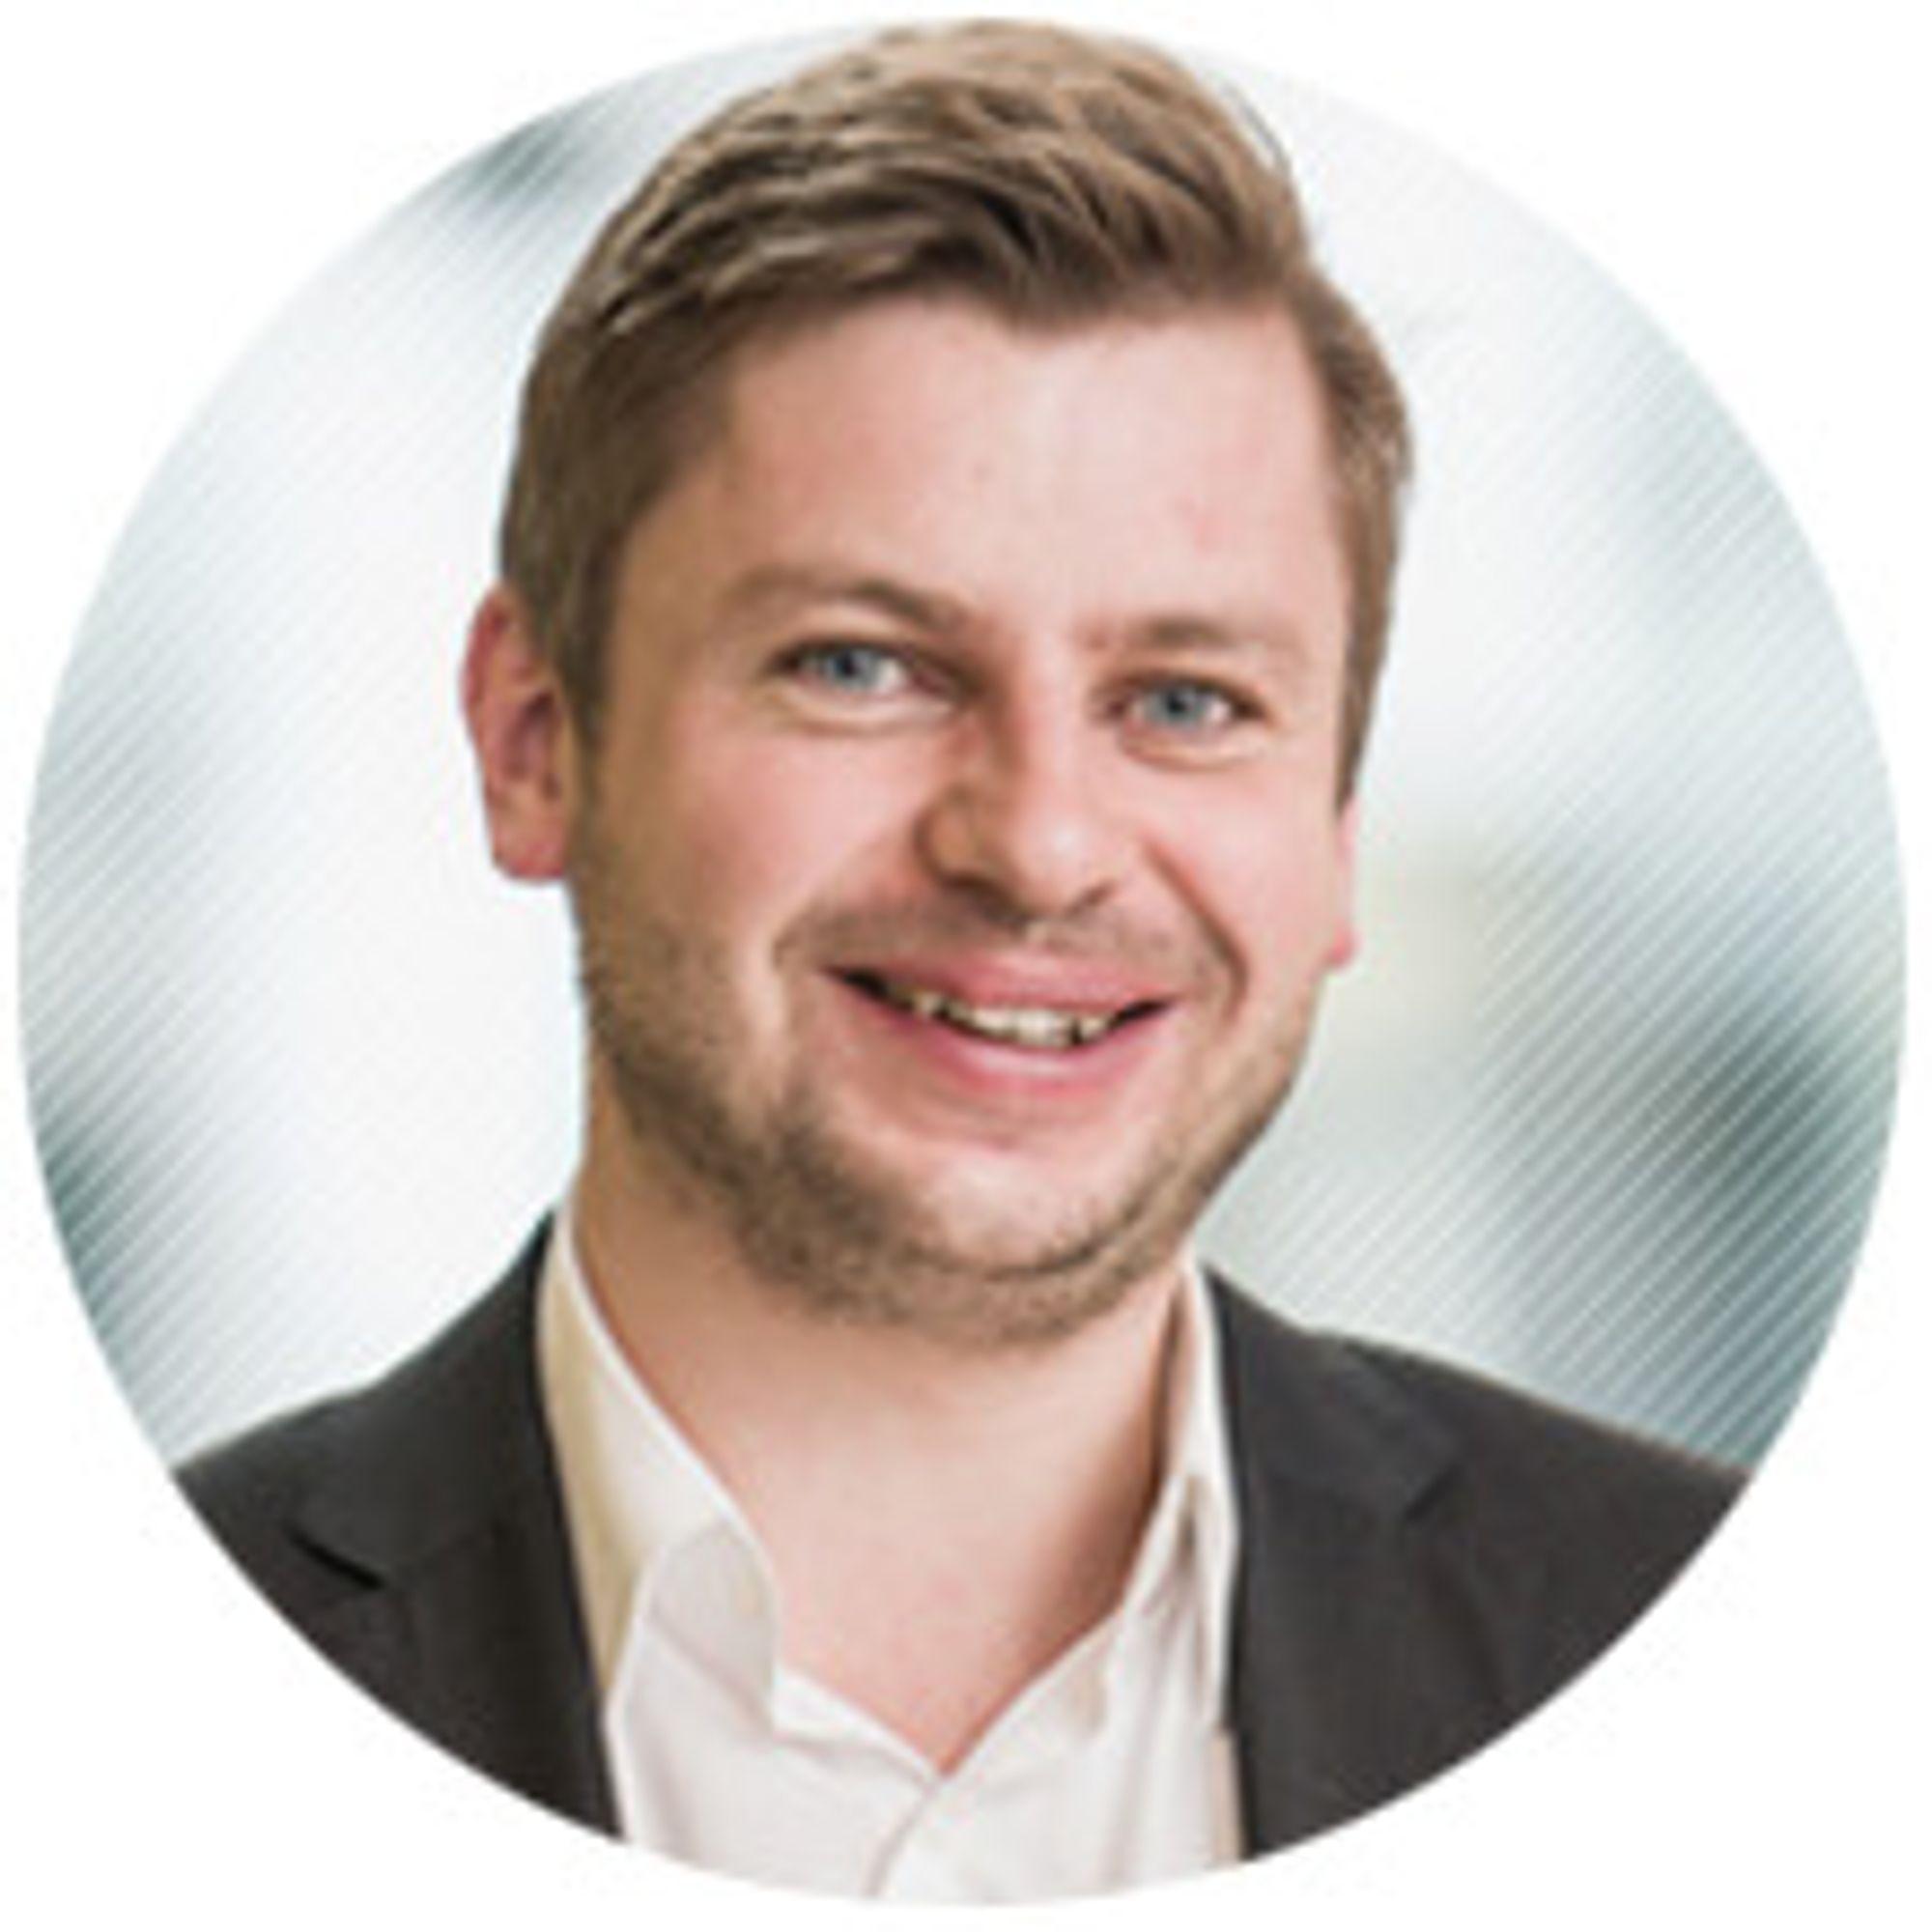 Ole Henrik Hannisdahl